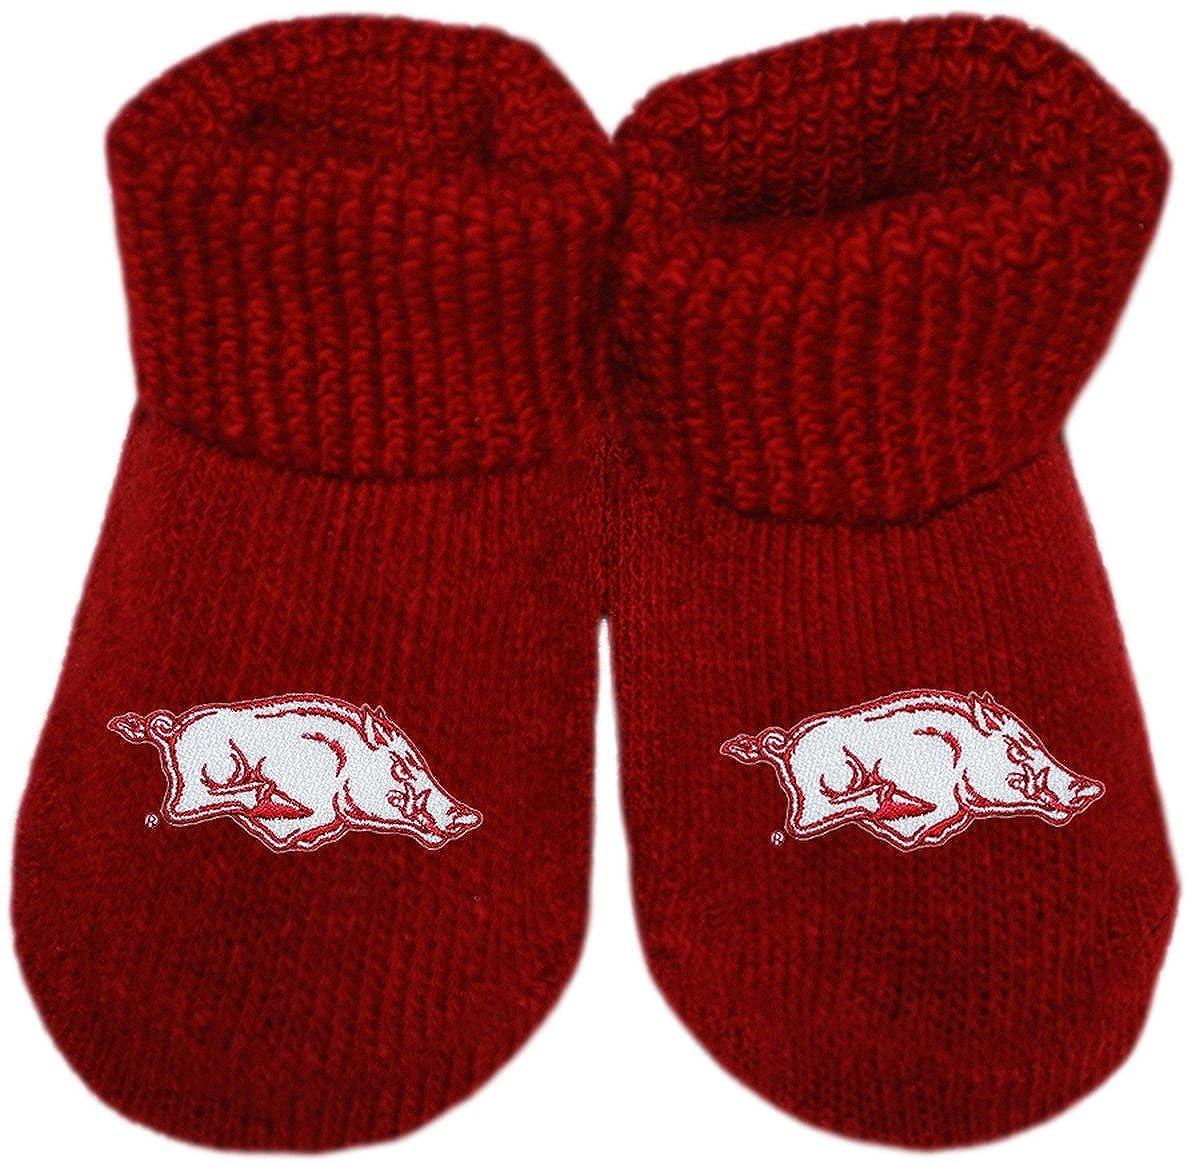 University of Arkansas Razorbacks Newborn Baby Bootie Sock